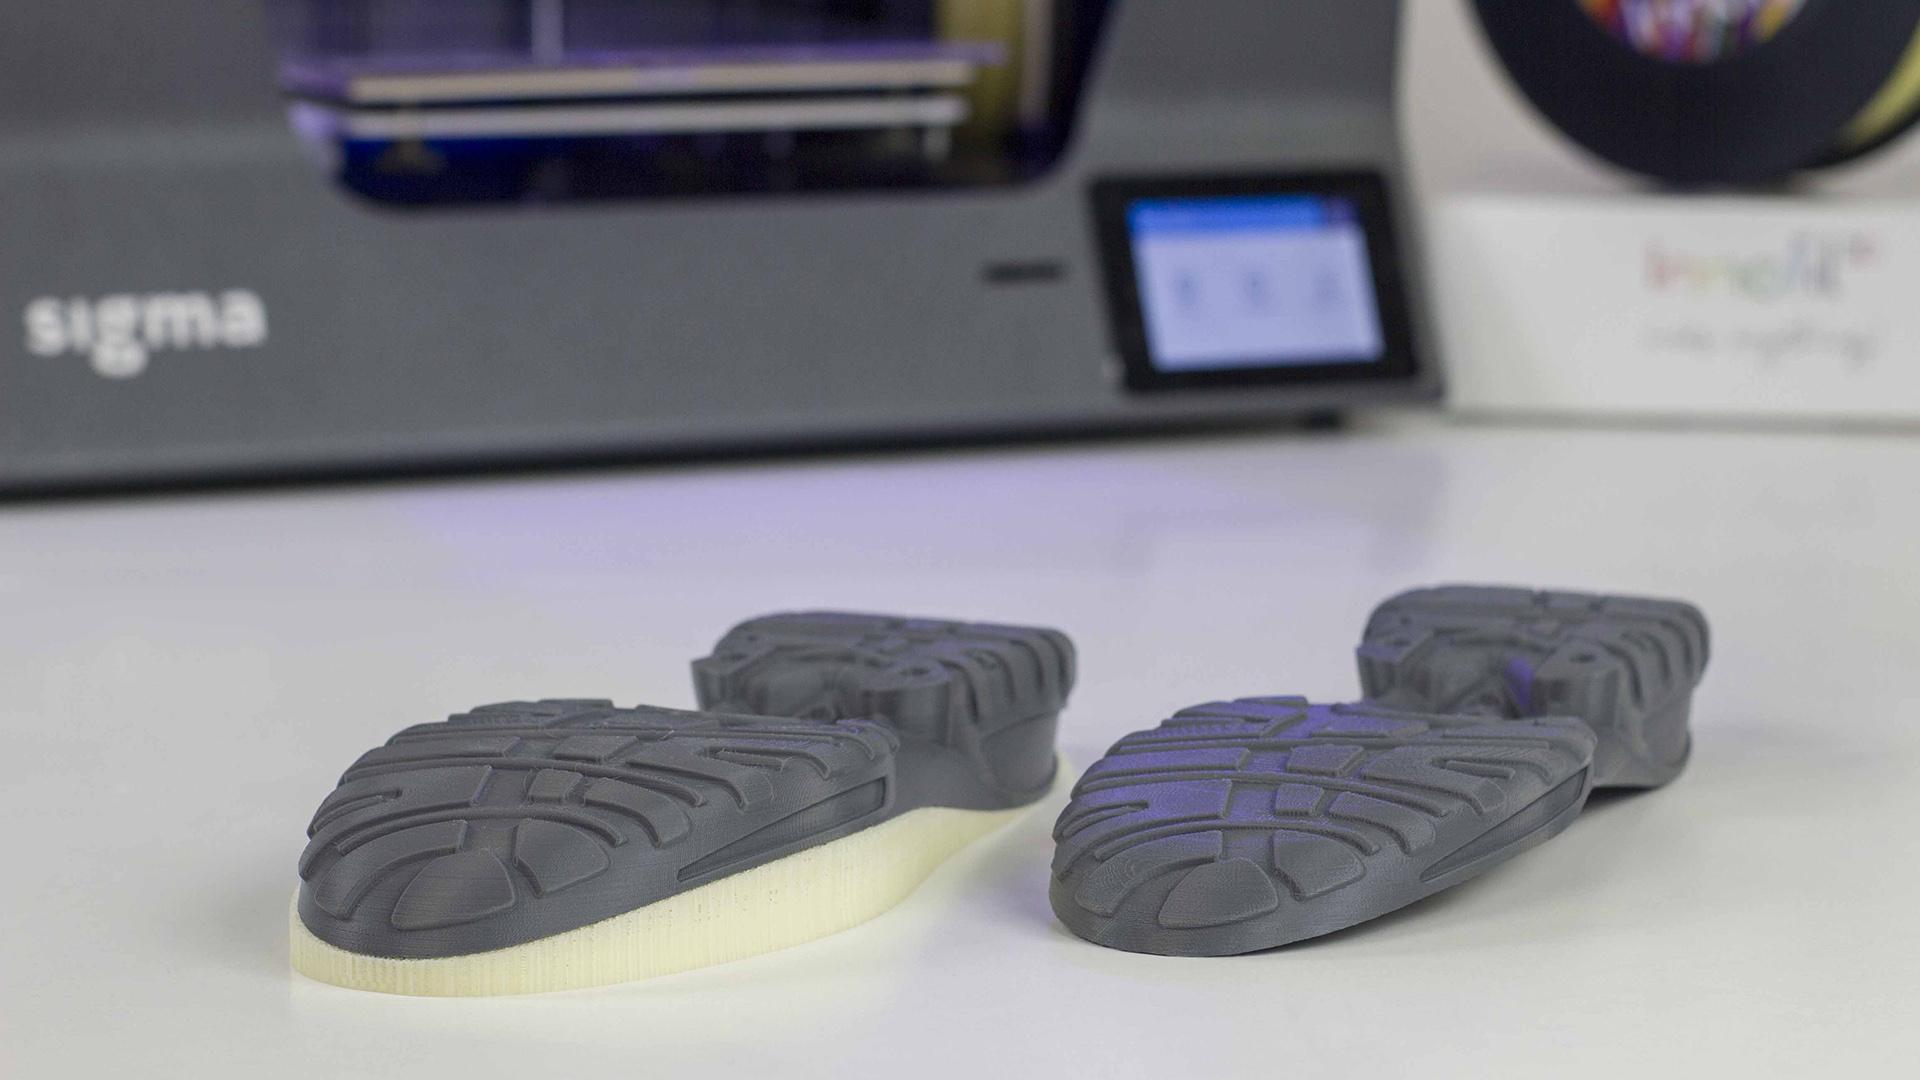 BCN3D_Sigma_Sigmax_tech_materials_innofil_innosolve_shoes_3D_printing